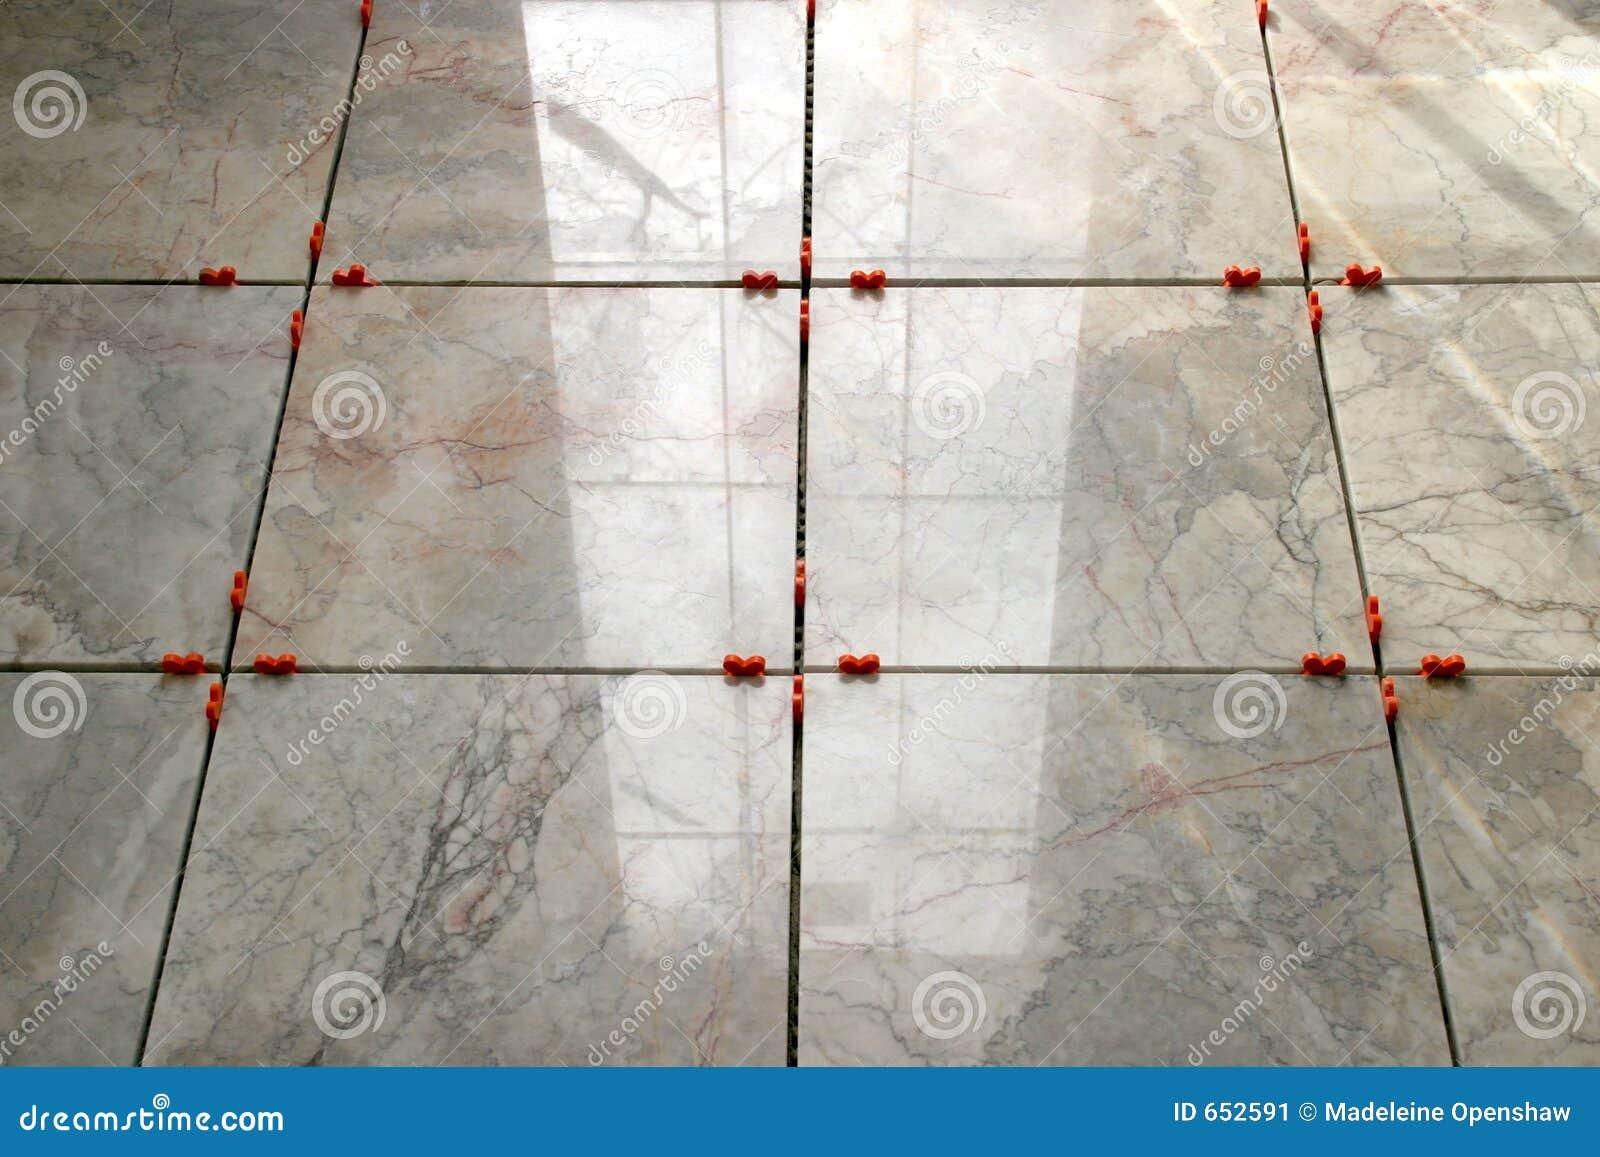 marmor fliesen 5 stockbild bild 652591. Black Bedroom Furniture Sets. Home Design Ideas